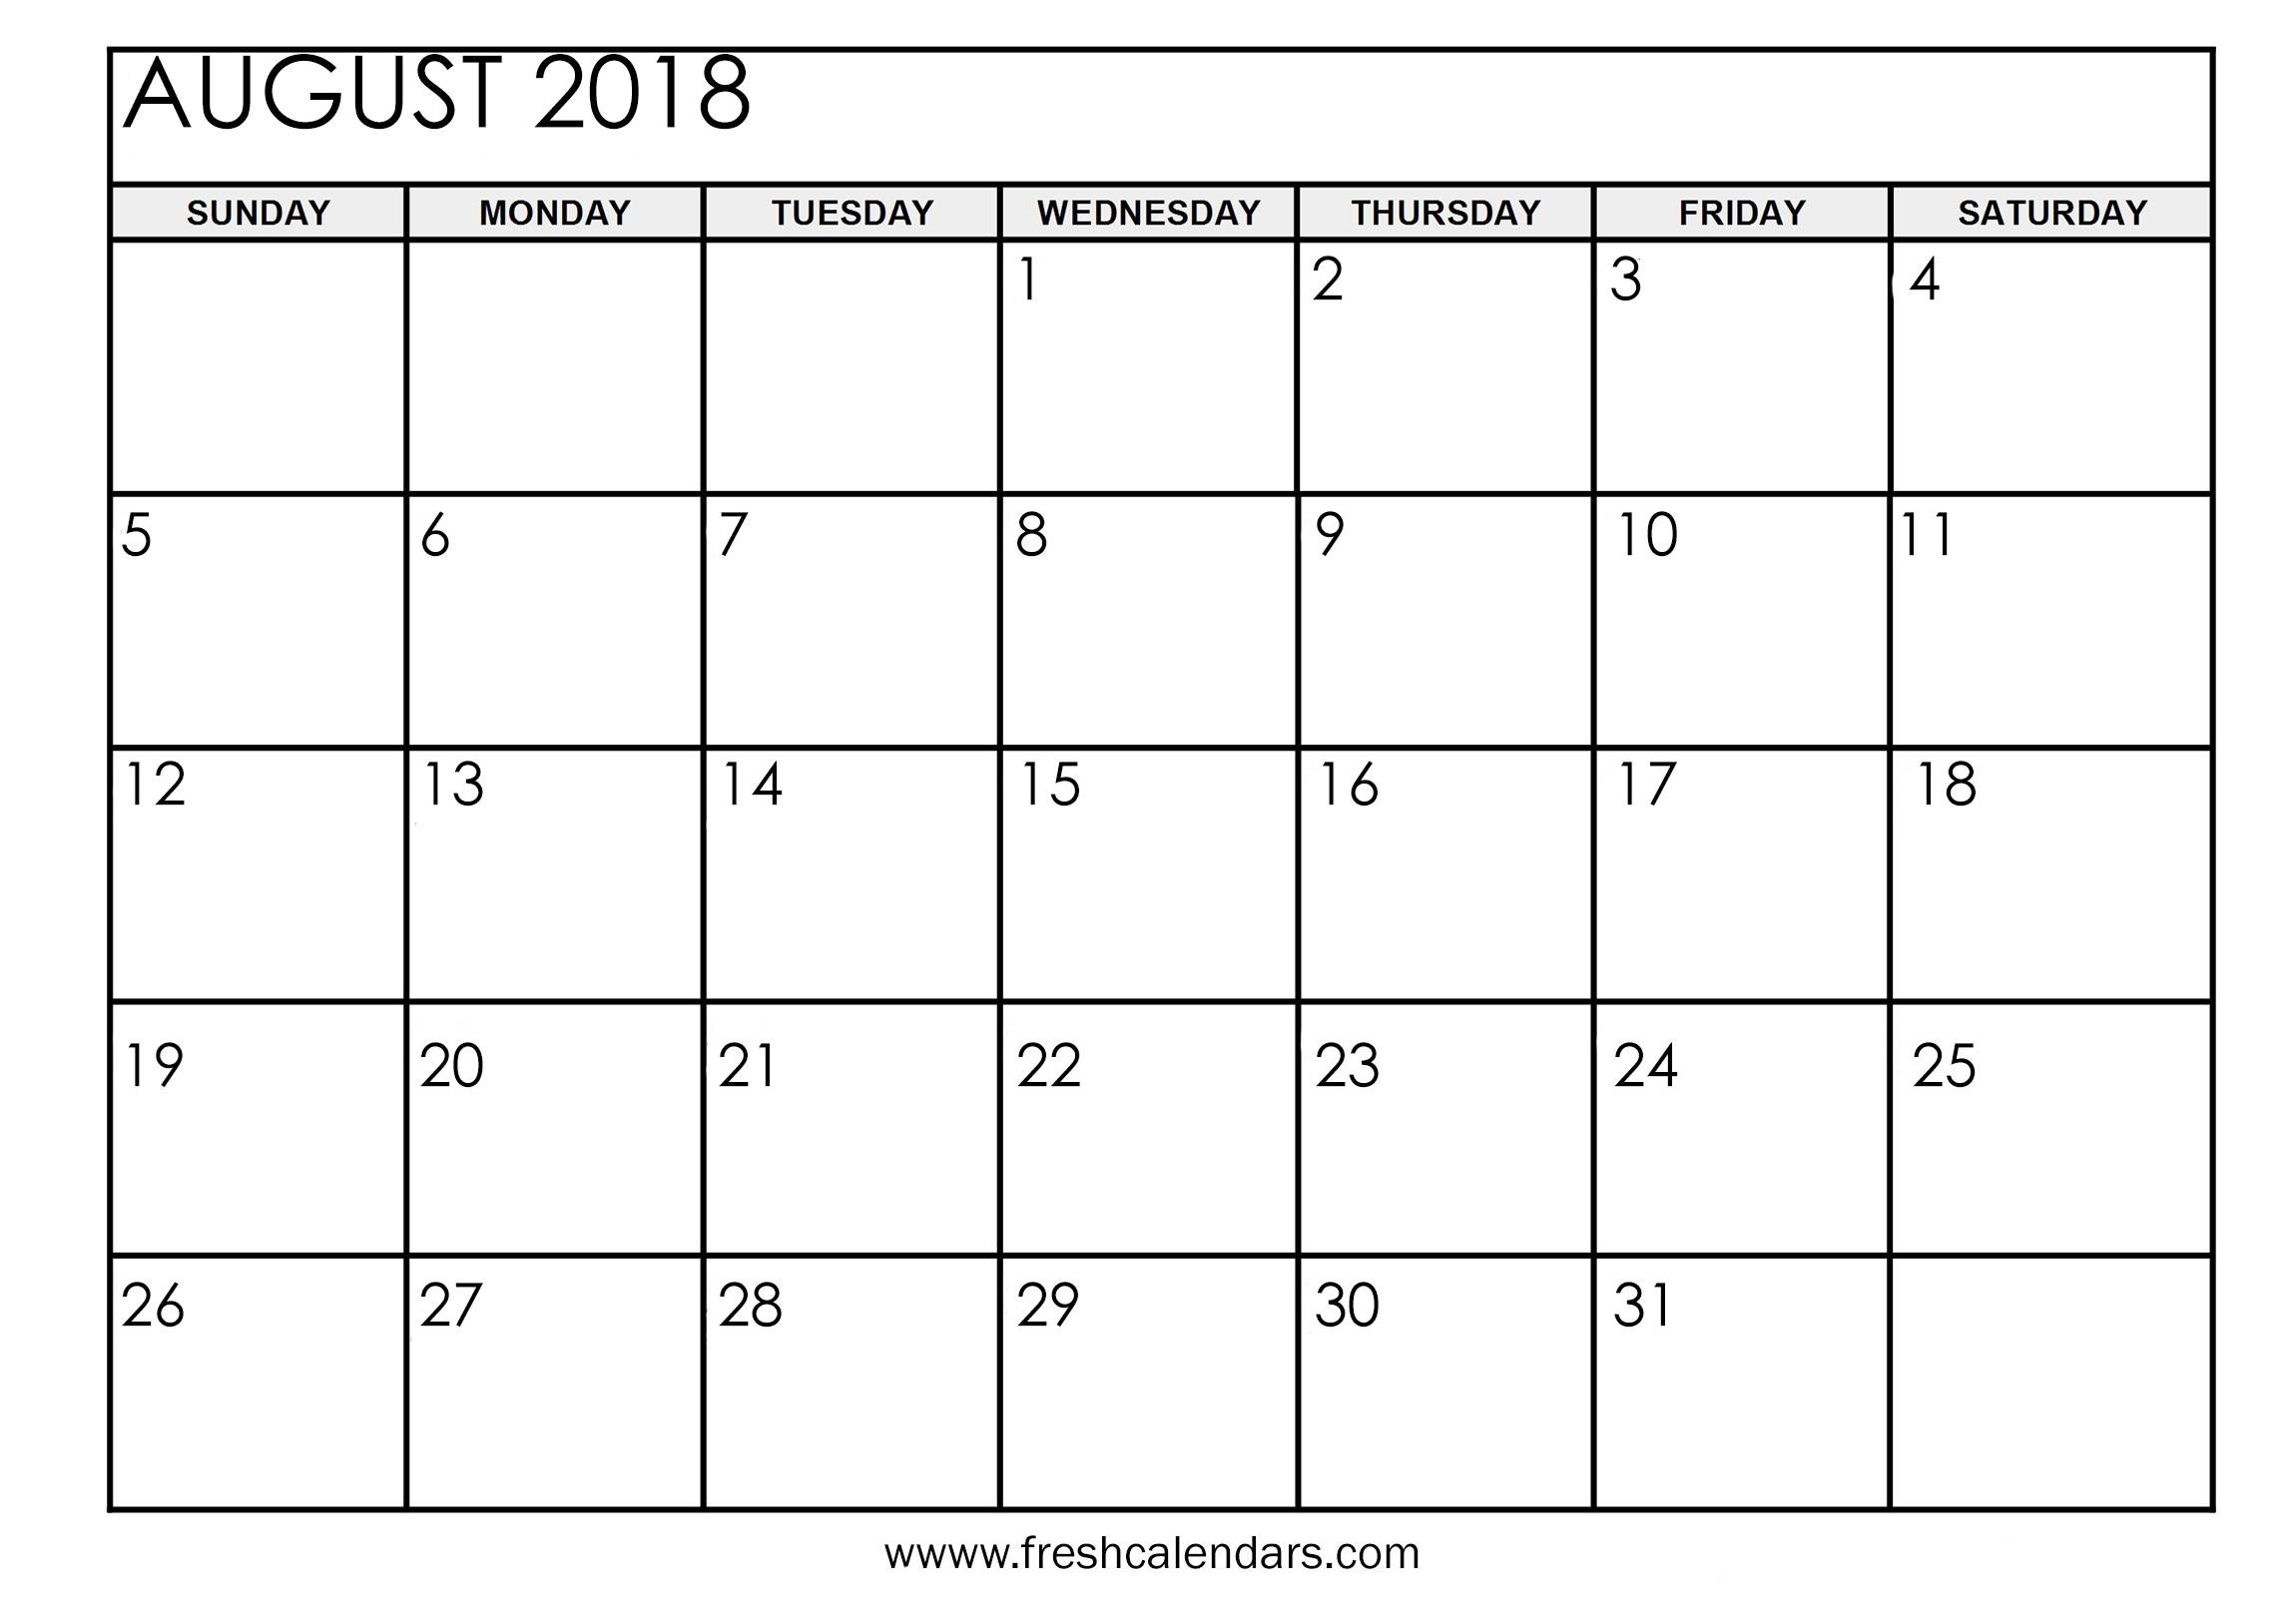 August 2018 Calendar Printable - Fresh Calendars-8X 10 Monthly Calaendar Printable